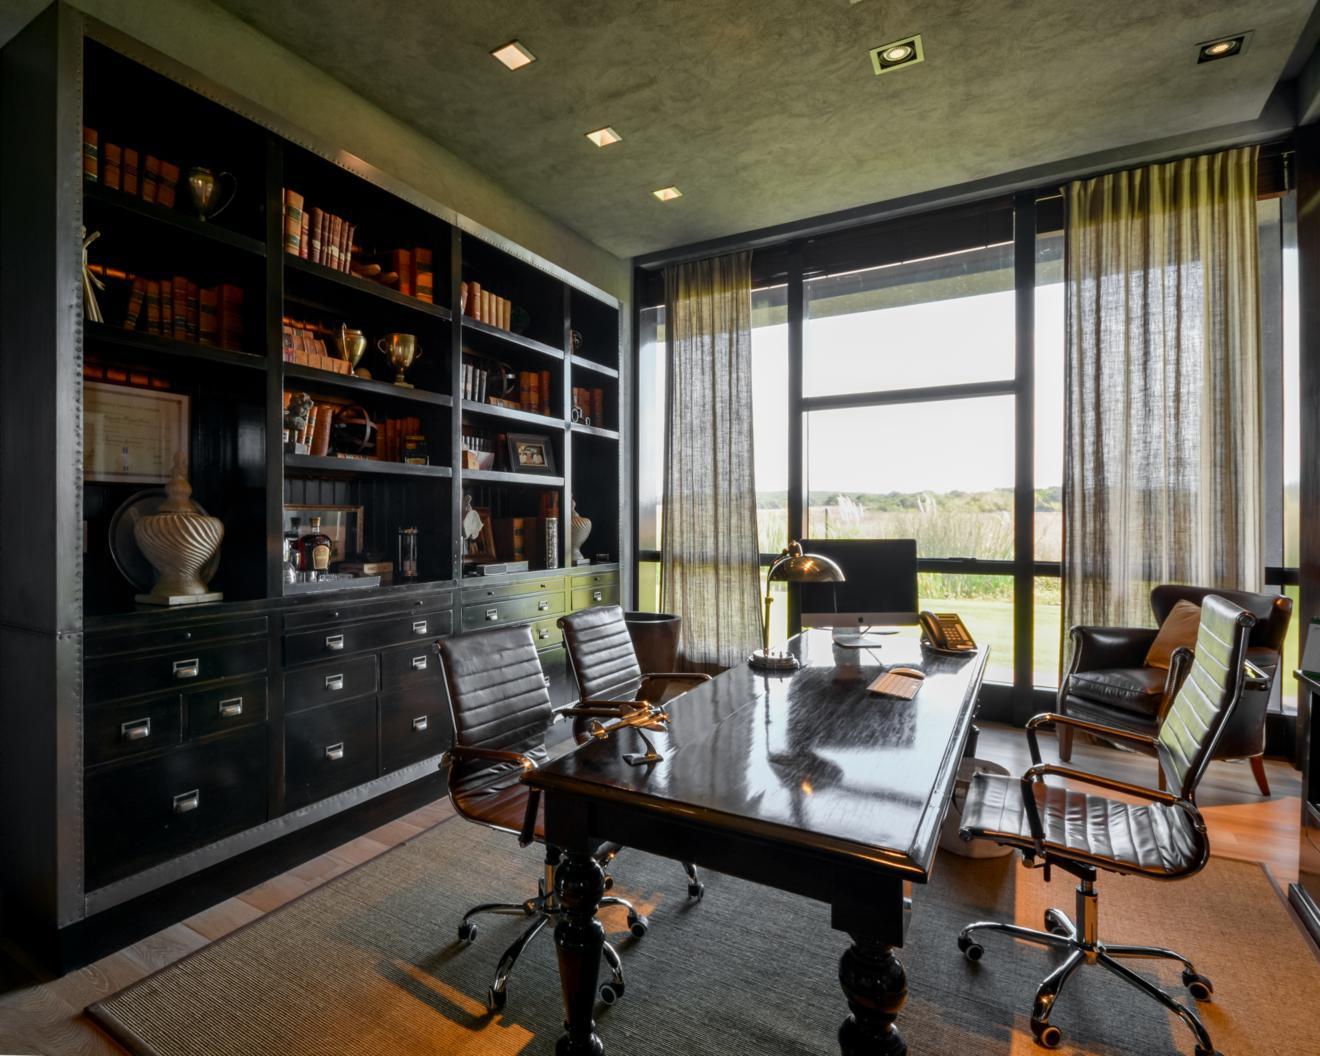 Oficinas 1 (1)_1320x1056